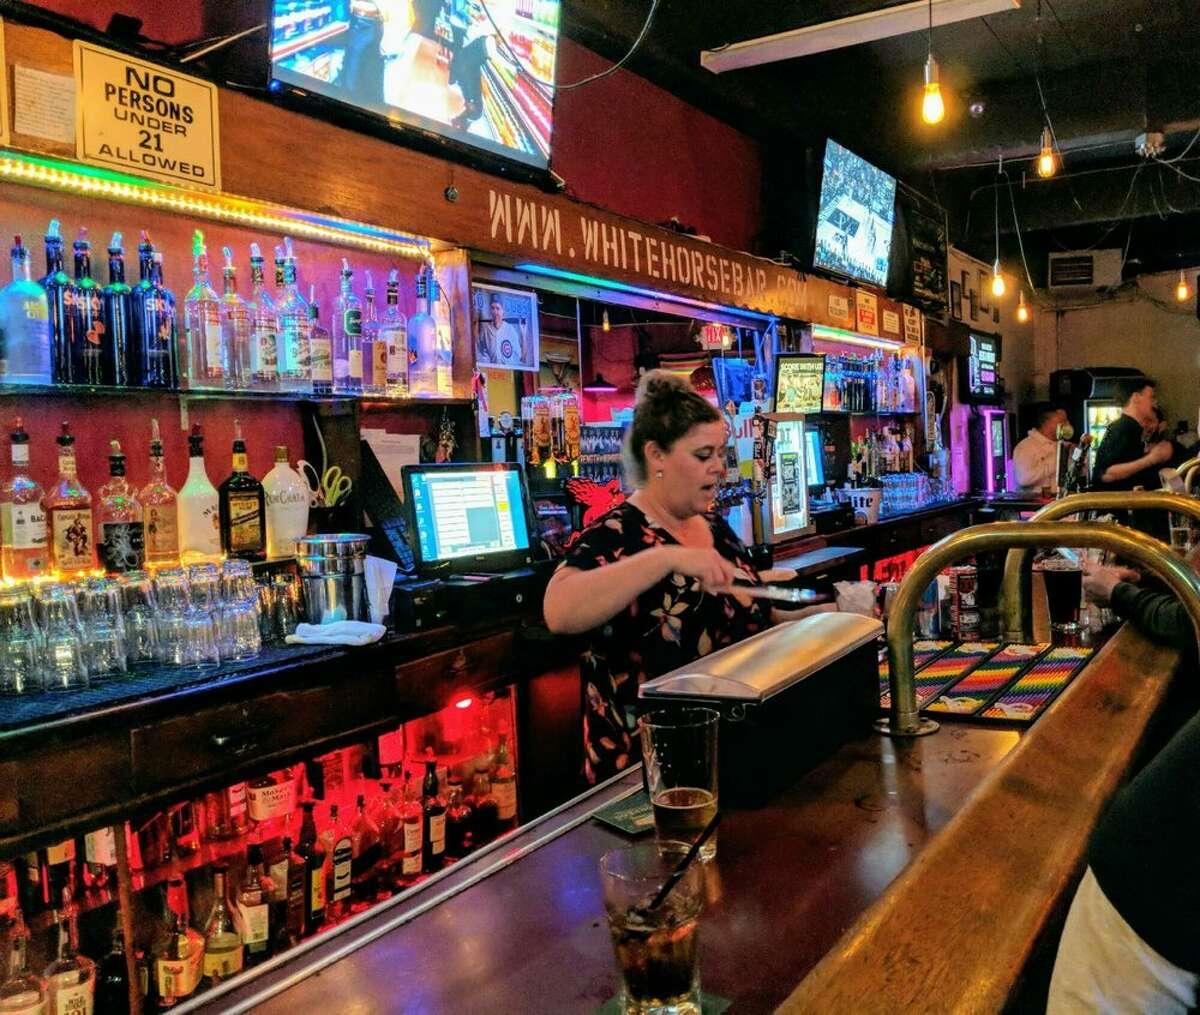 The last gay bar in the tenderloin